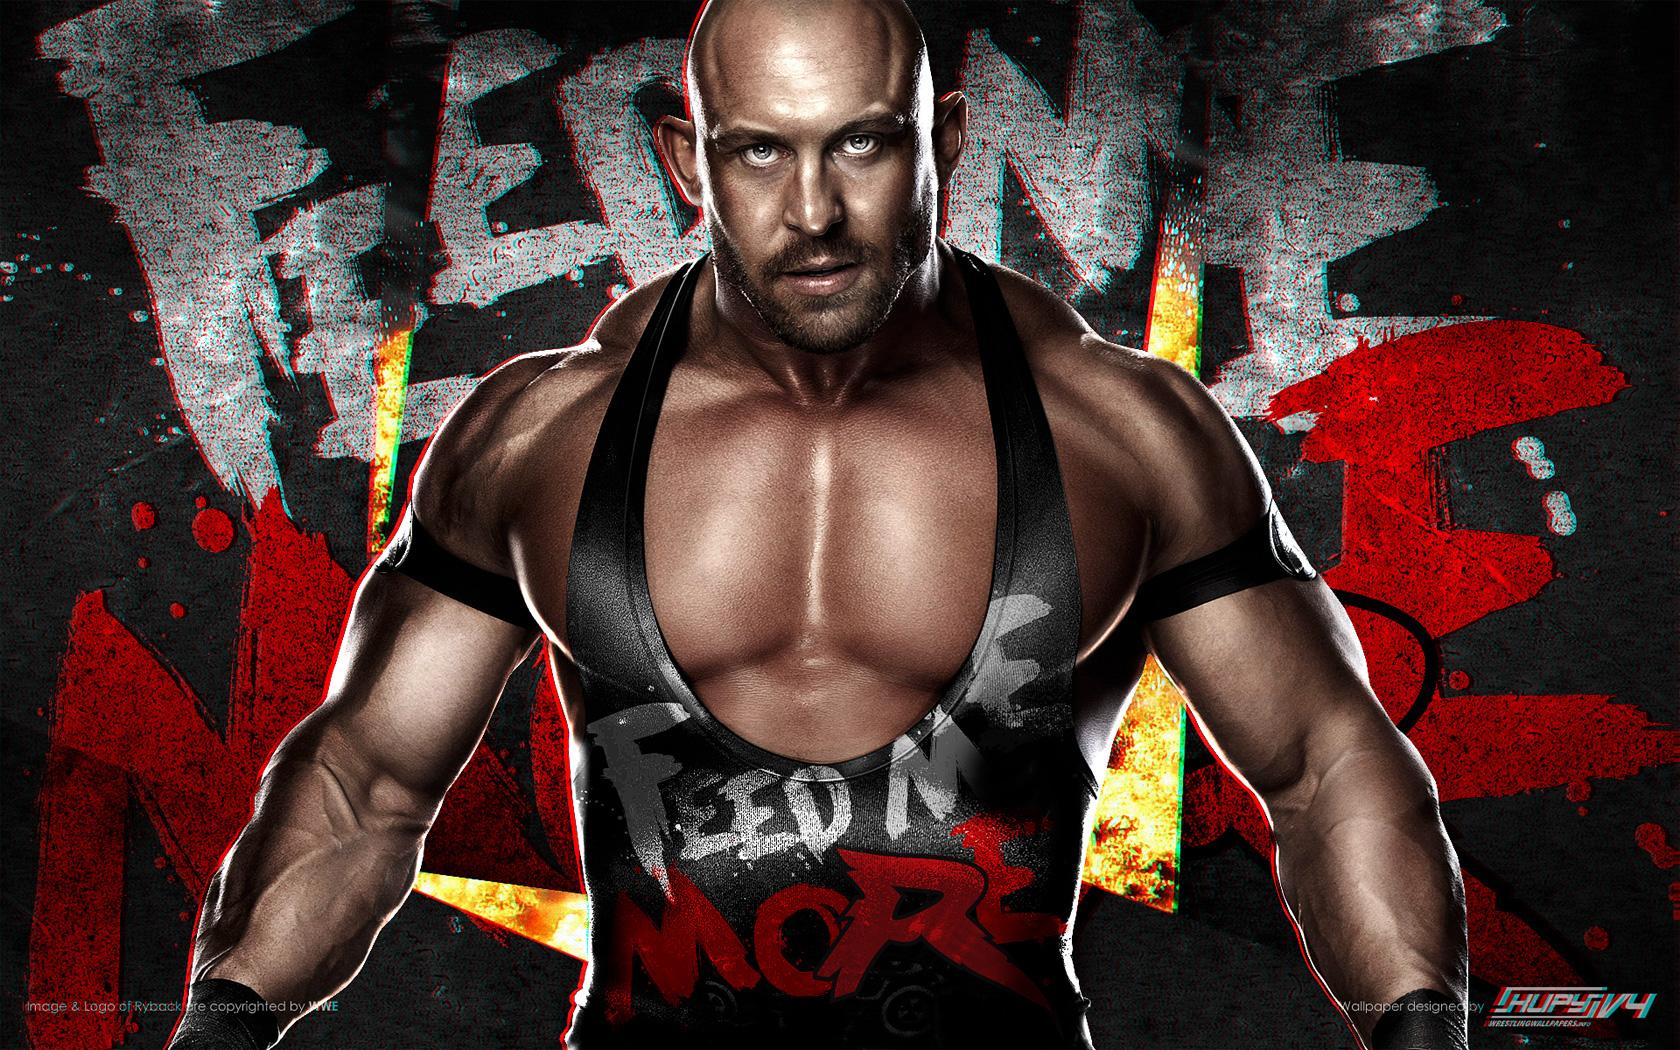 HIAC WWE Championship CM Punkc vs Ryback wallpaper 1680x1050